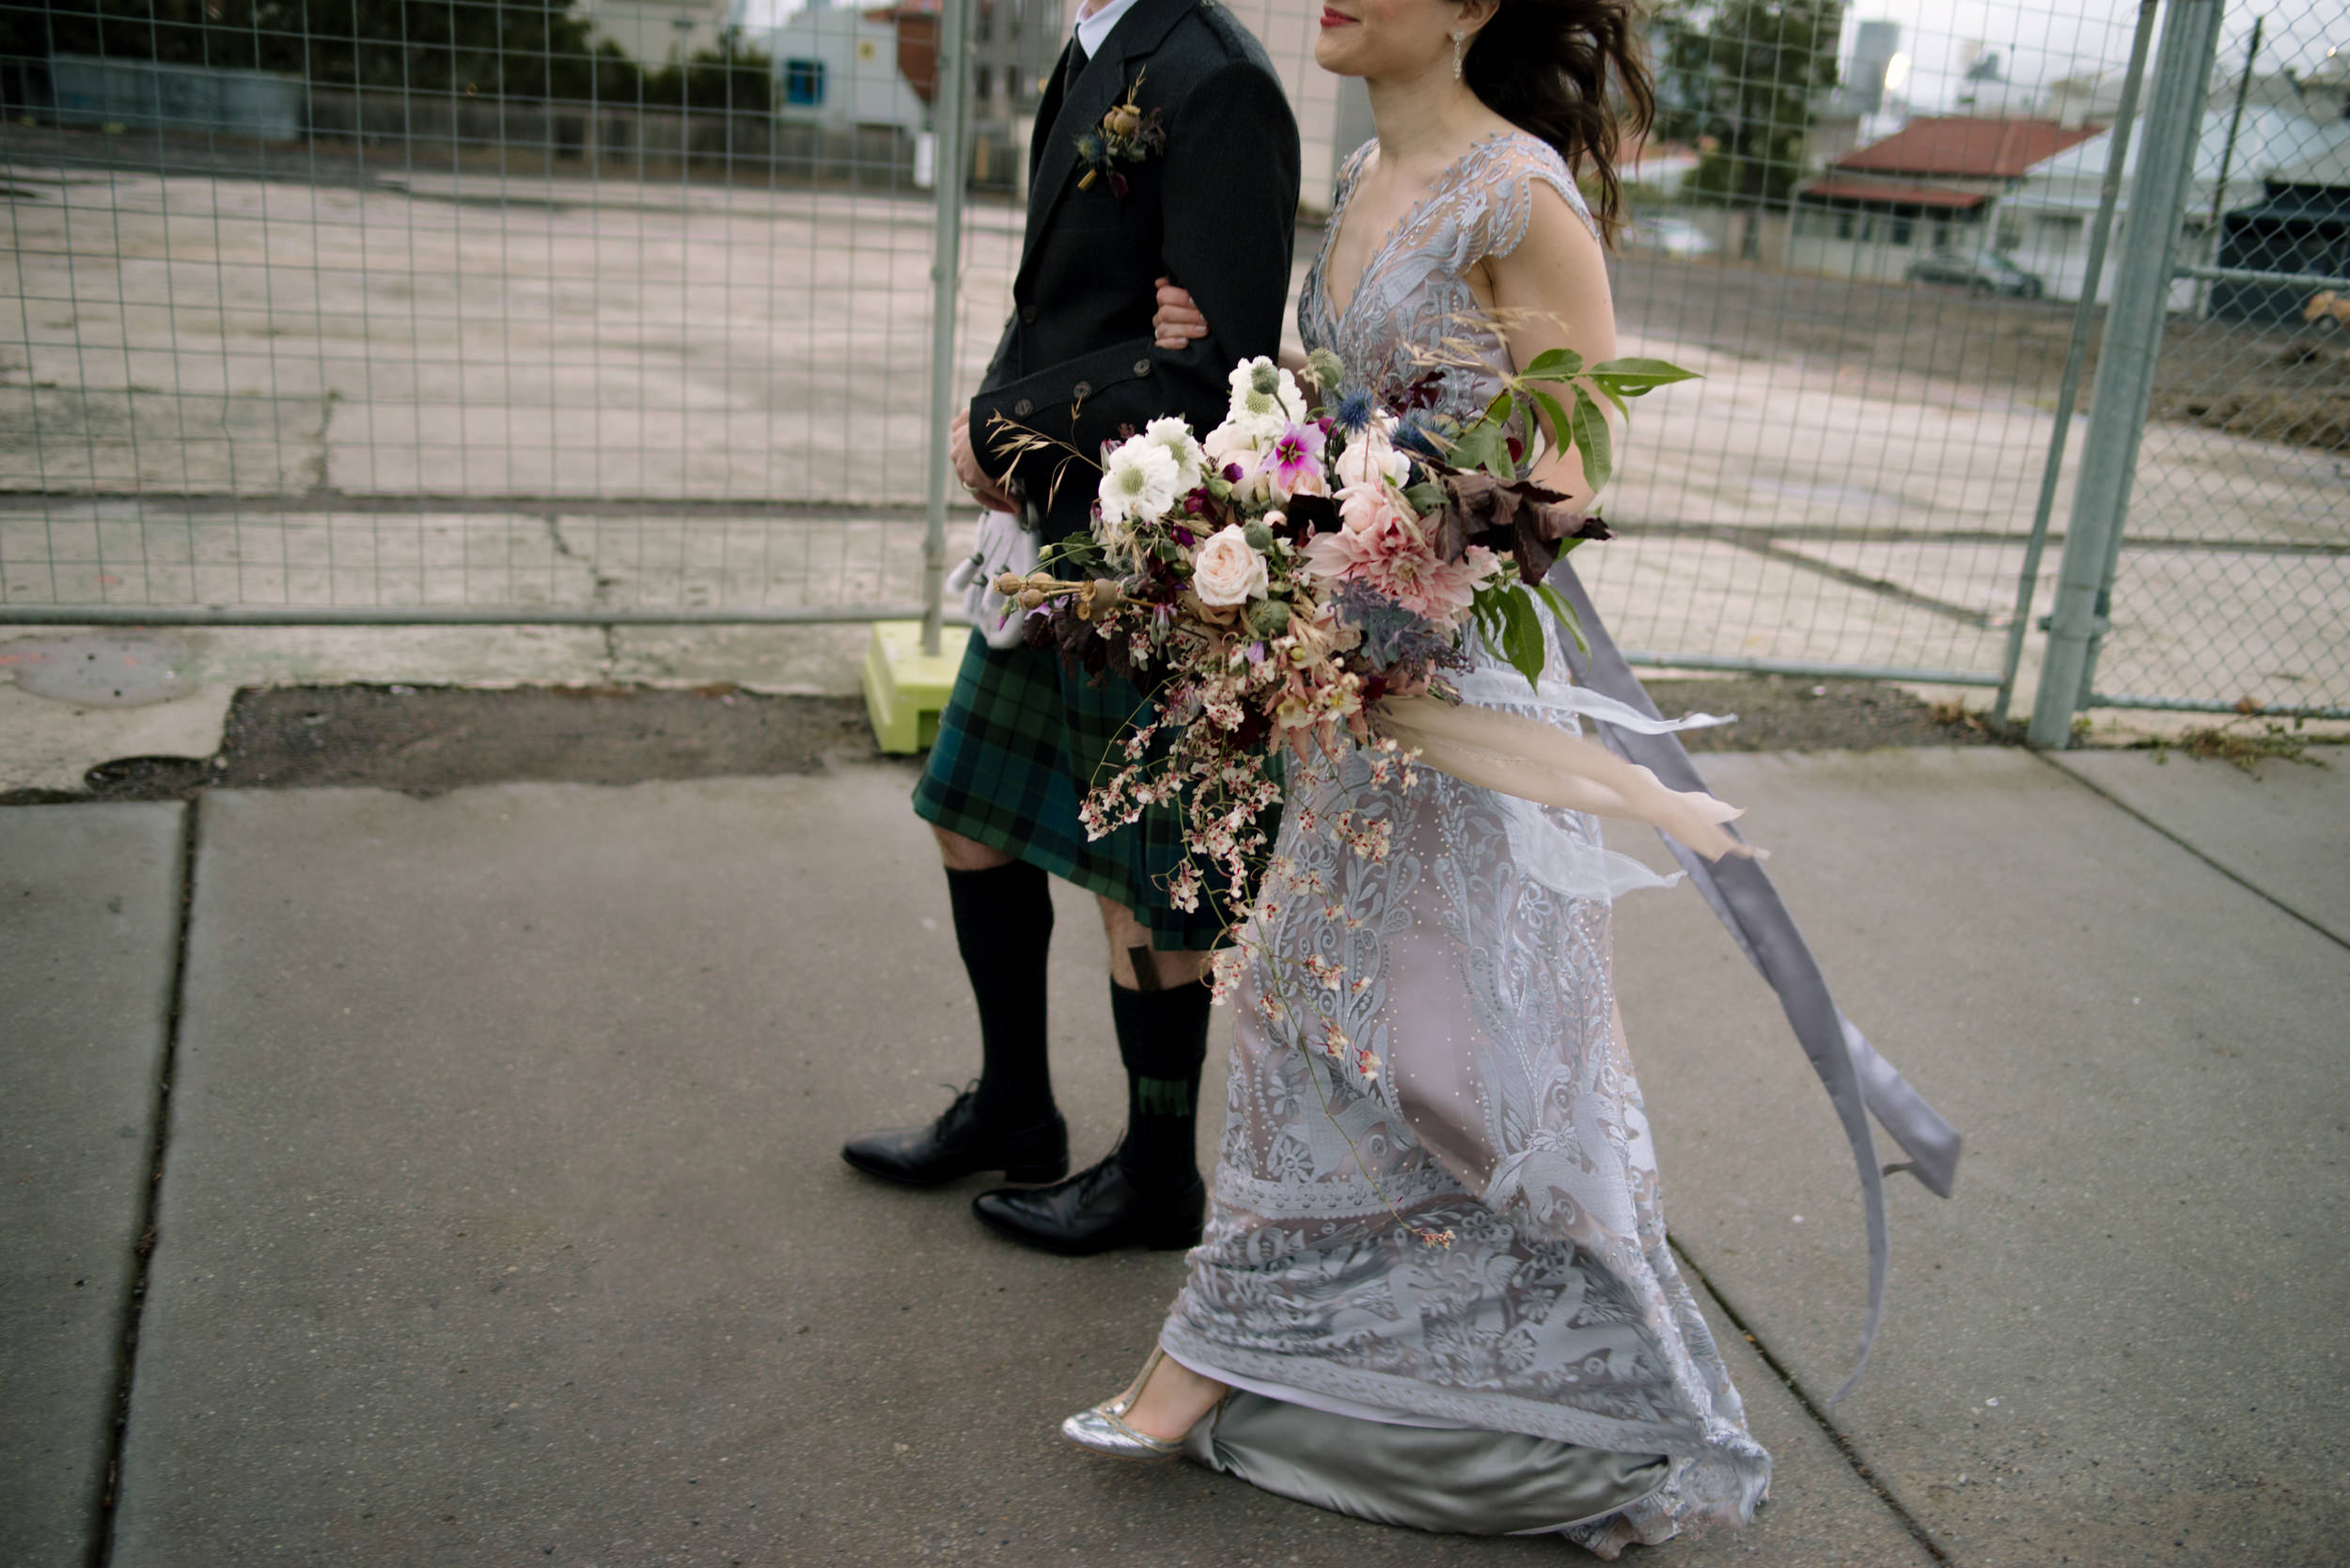 I-Got-You-Babe-&.Co.-Glasshaus-Wedding-Charlotte-Cameron0103.JPG